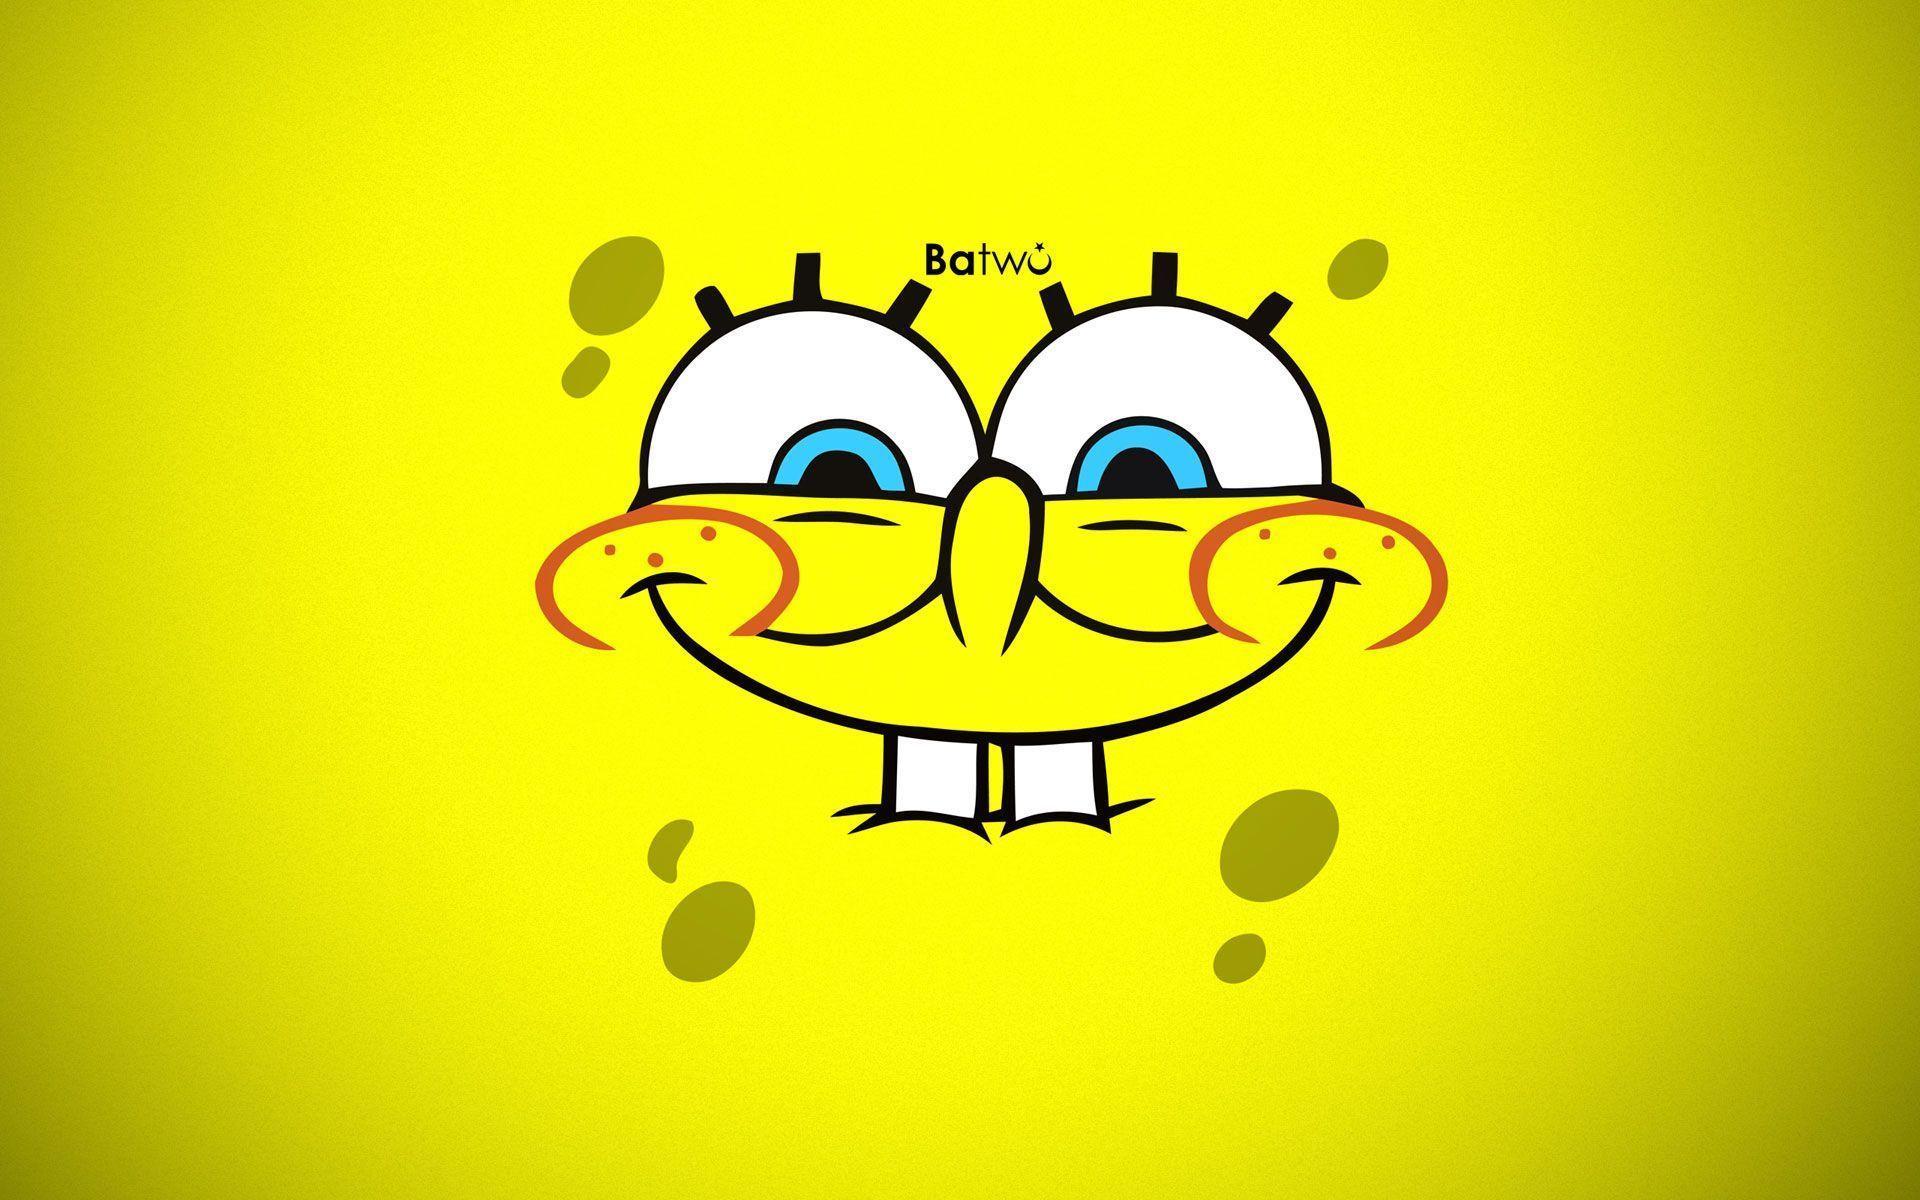 Spongebob Wallpaper Widescreen Related Keywords &amp- Suggestions ...